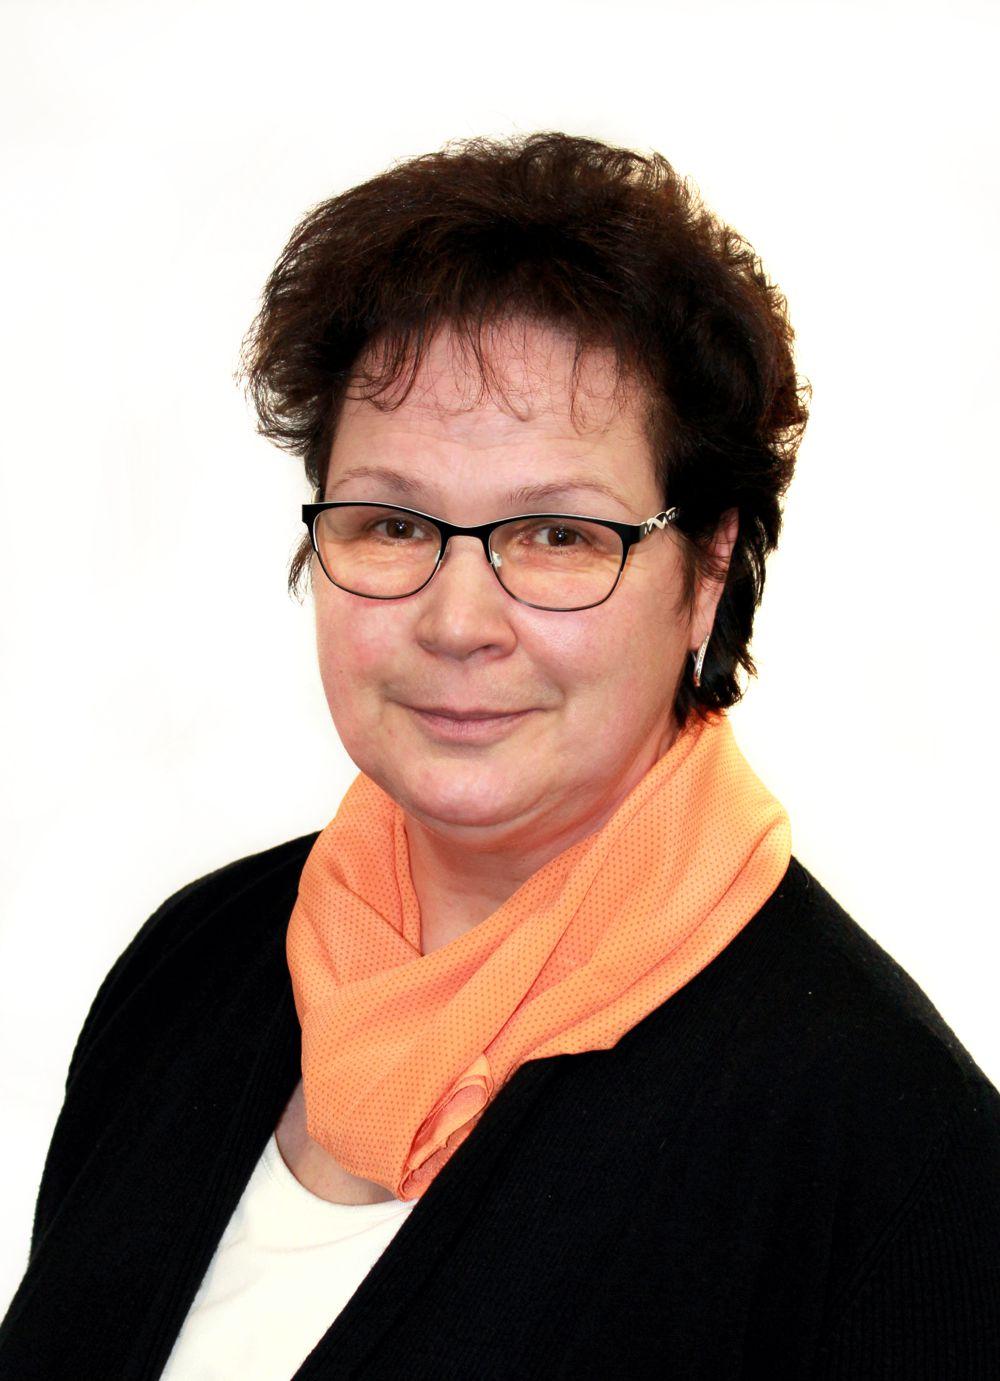 Ansprechpartner Filiale Plate - Raiffeisenbank eG Hagenow